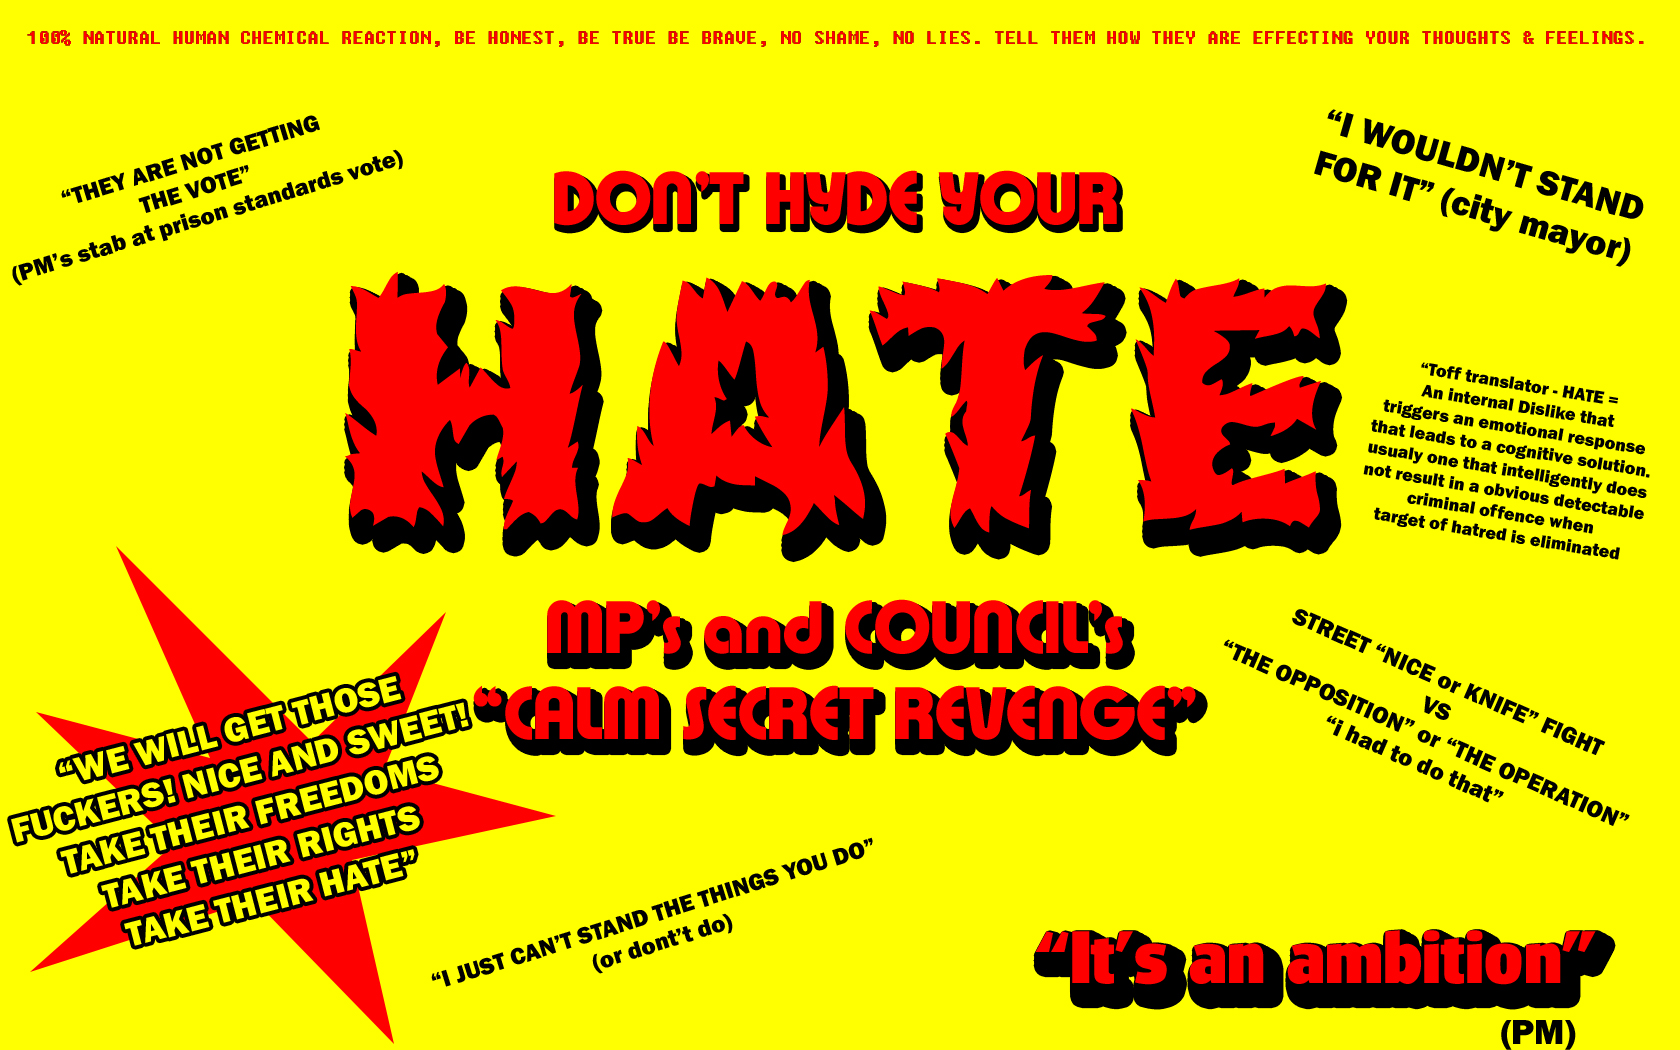 http://www.bentcop.biz/hate.jpg